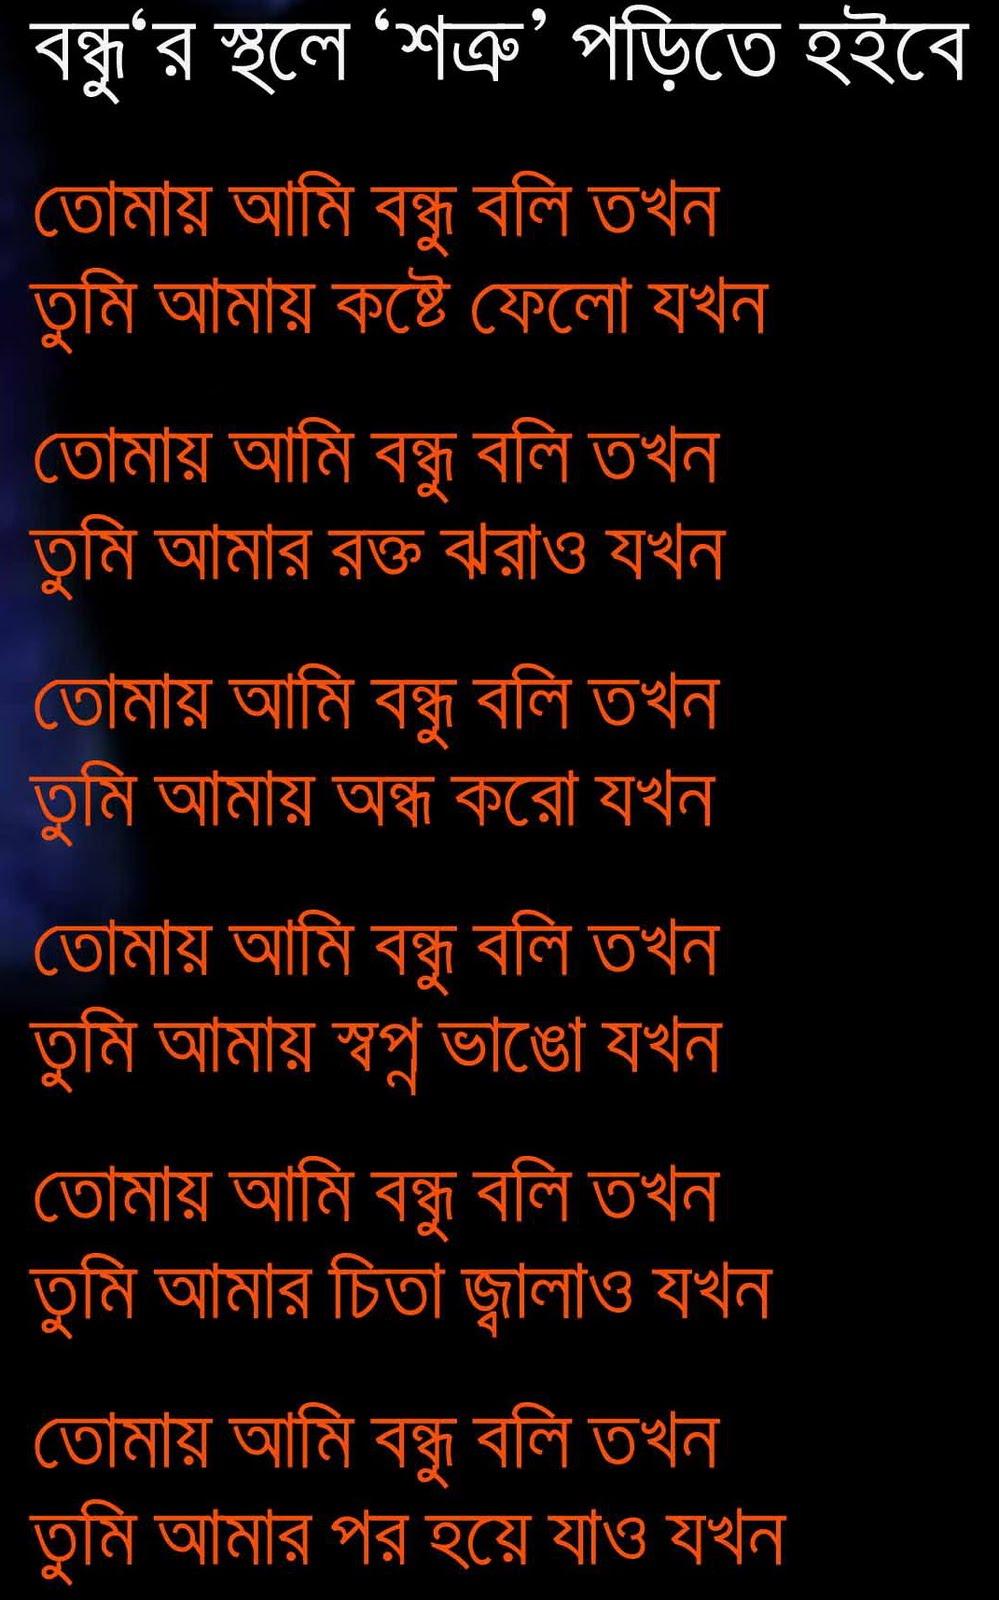 bengali to english translation pdf